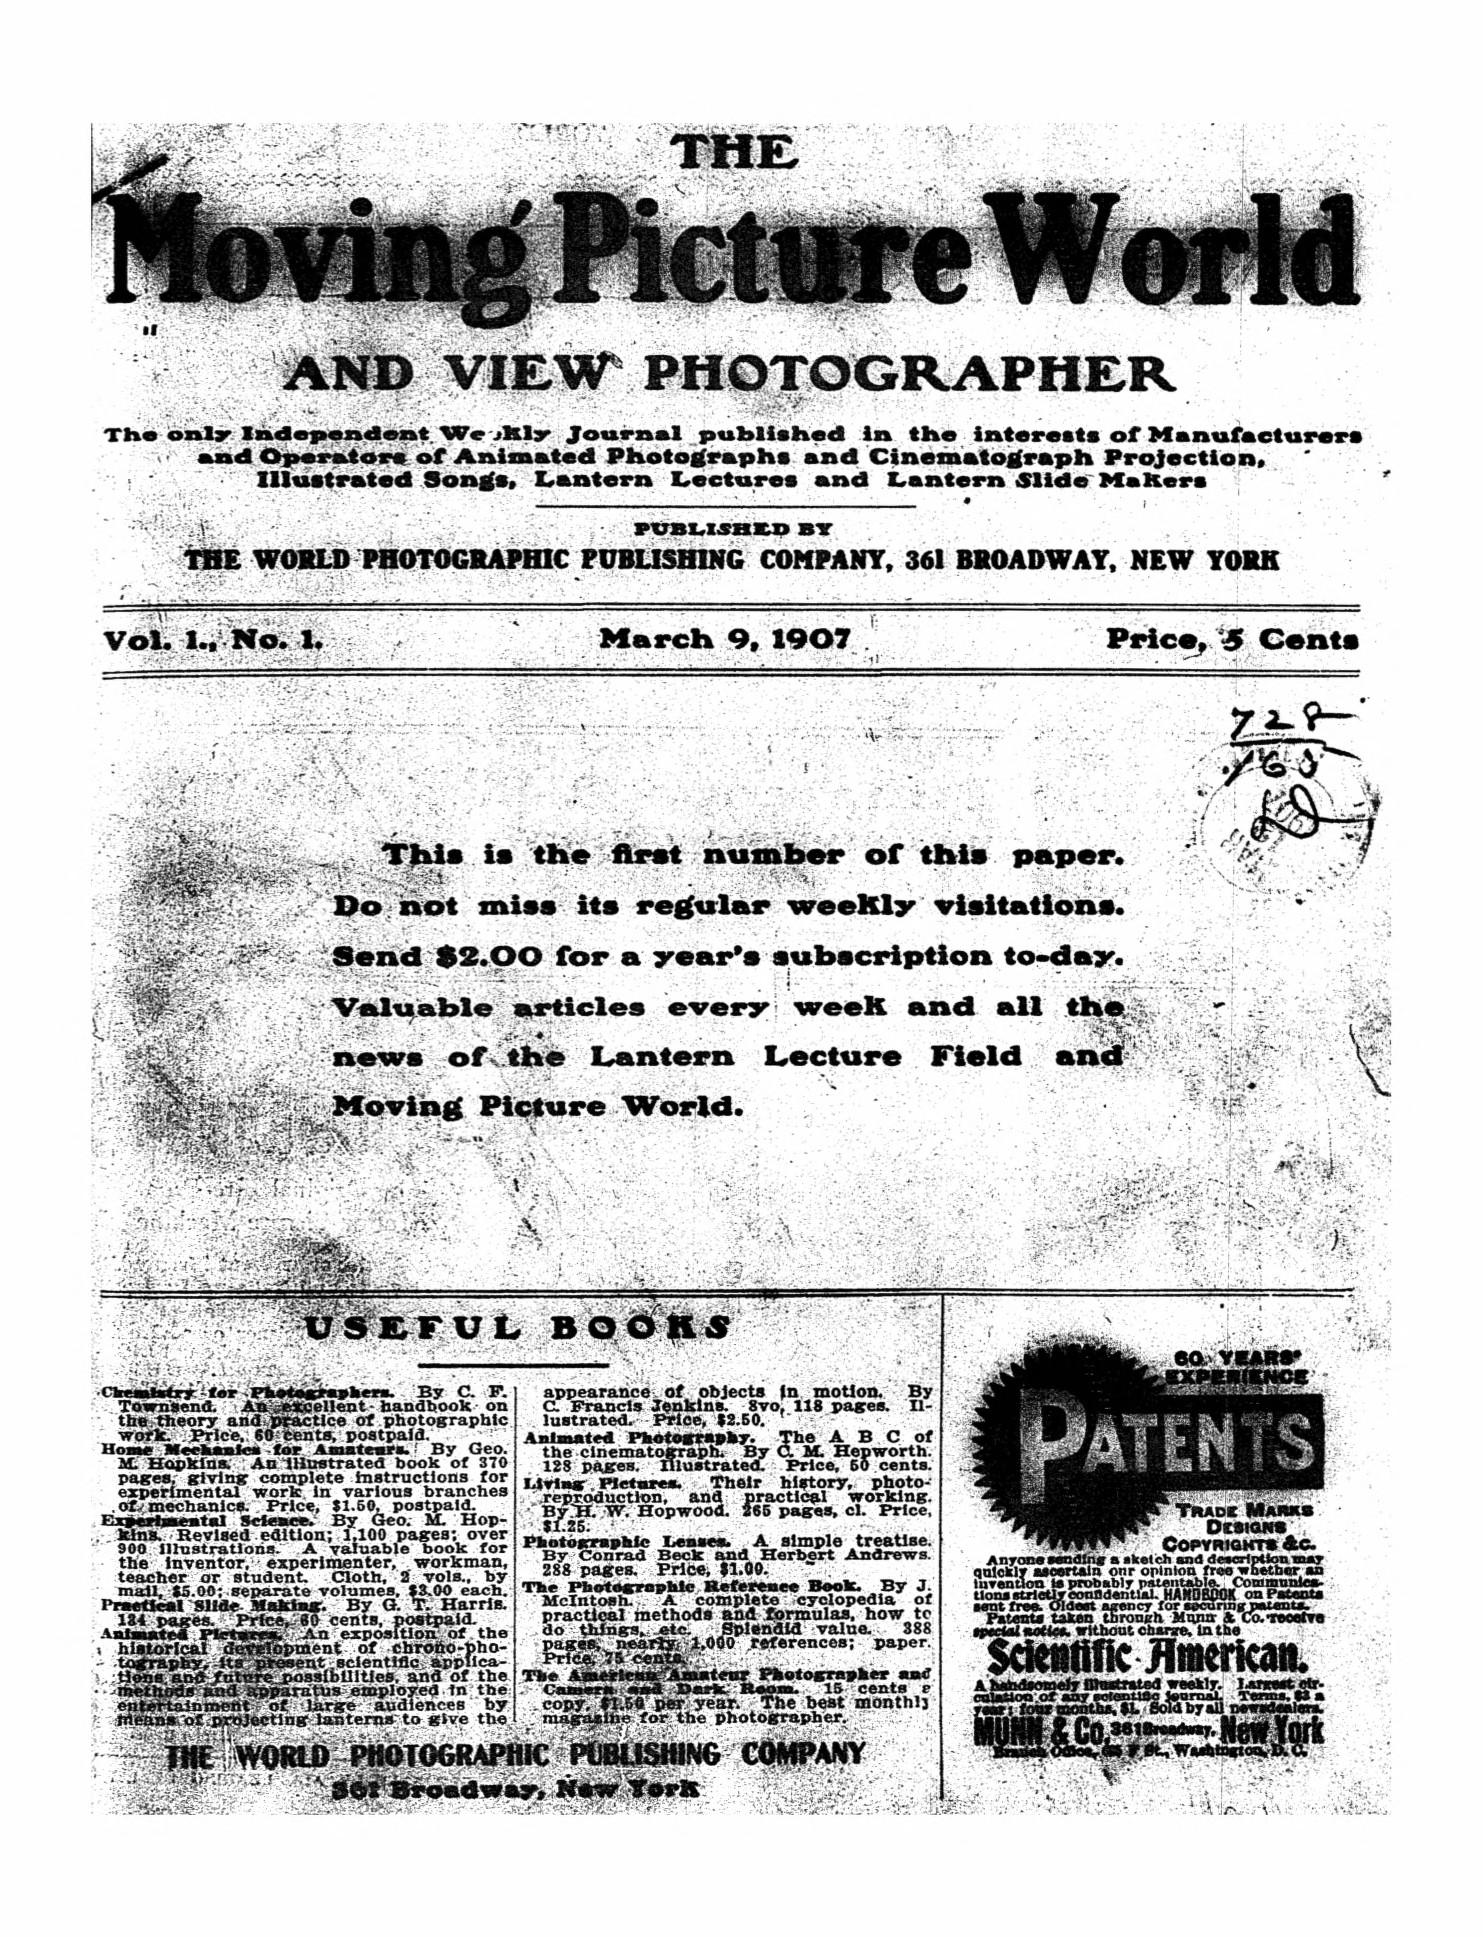 Mpw01-1907-03_jp2.zip&file=mpw01-1907-03_jp2%2fmpw01-1907-03_0000